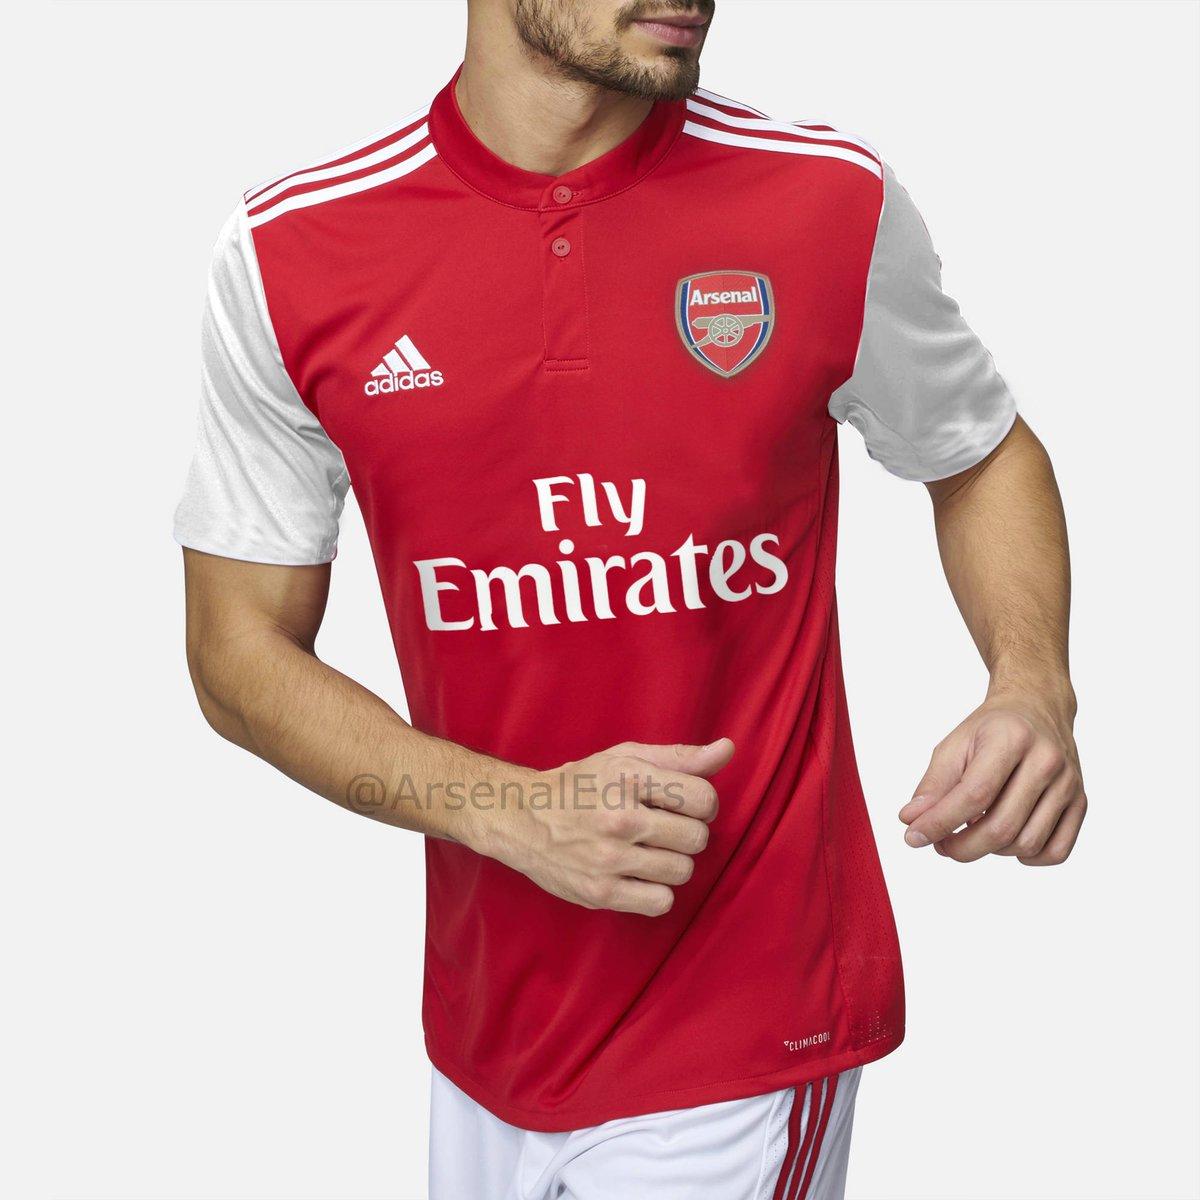 adidas-arsenal-kit-concept+%25282%2529.j